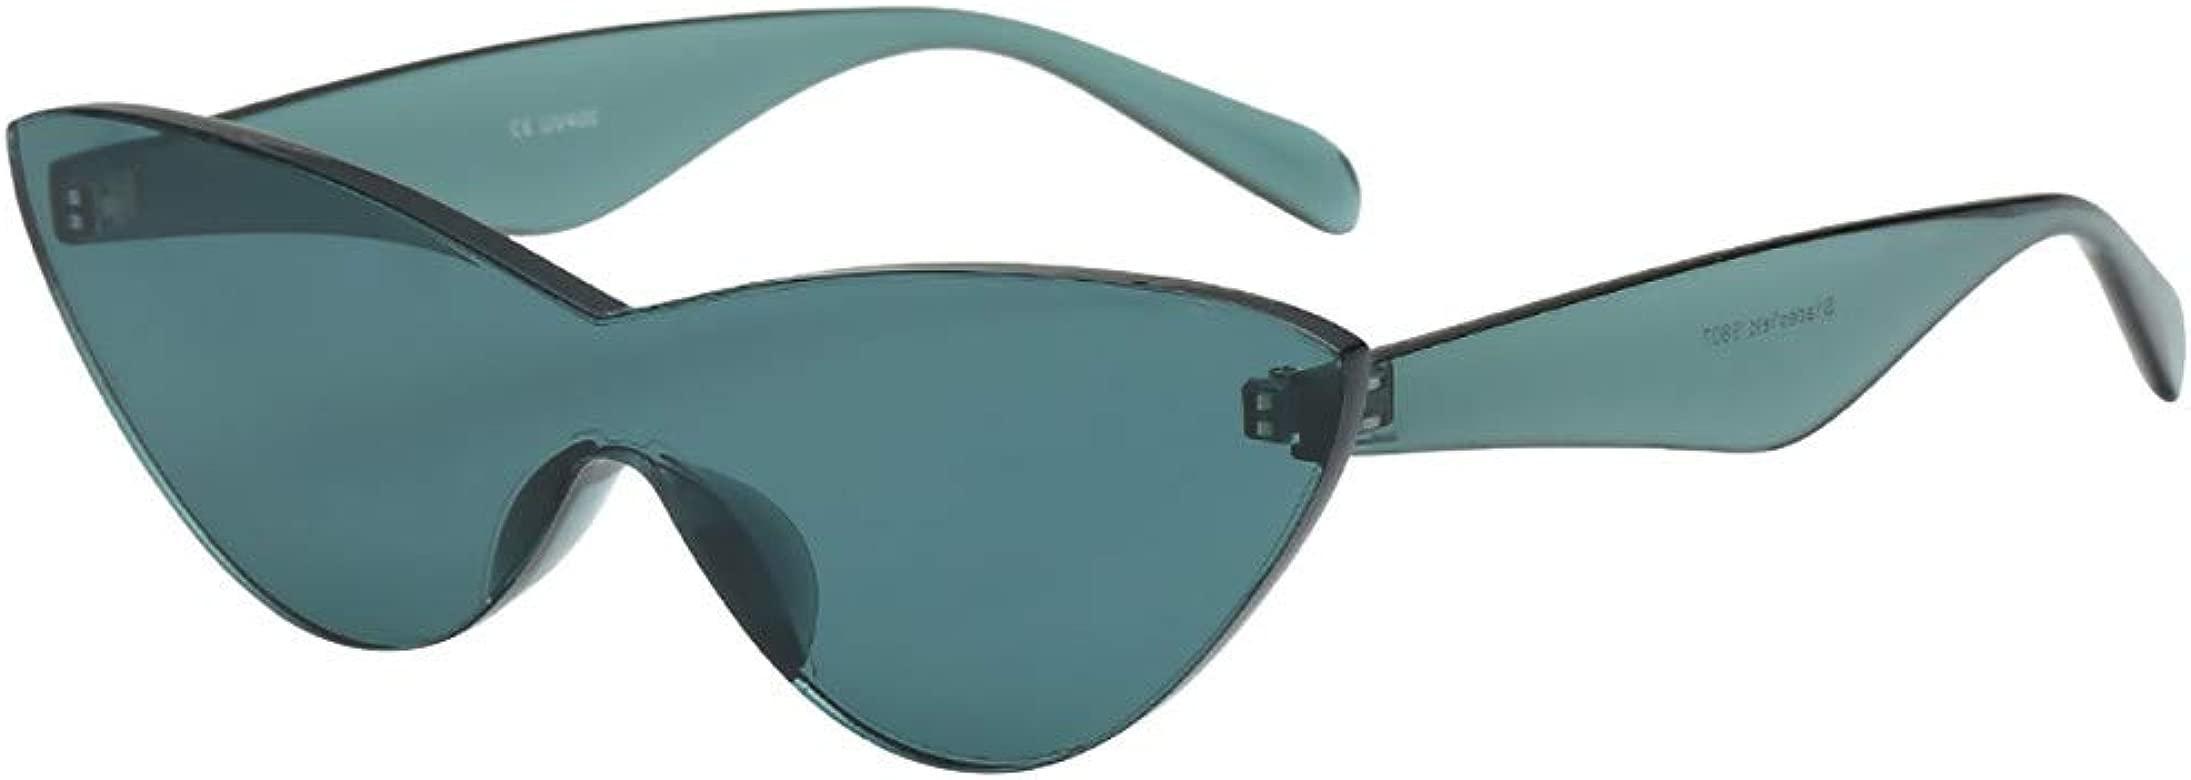 Cebbay Espejo de Moda Polarizadas Ojo de Gato Gafas de Sol para ...